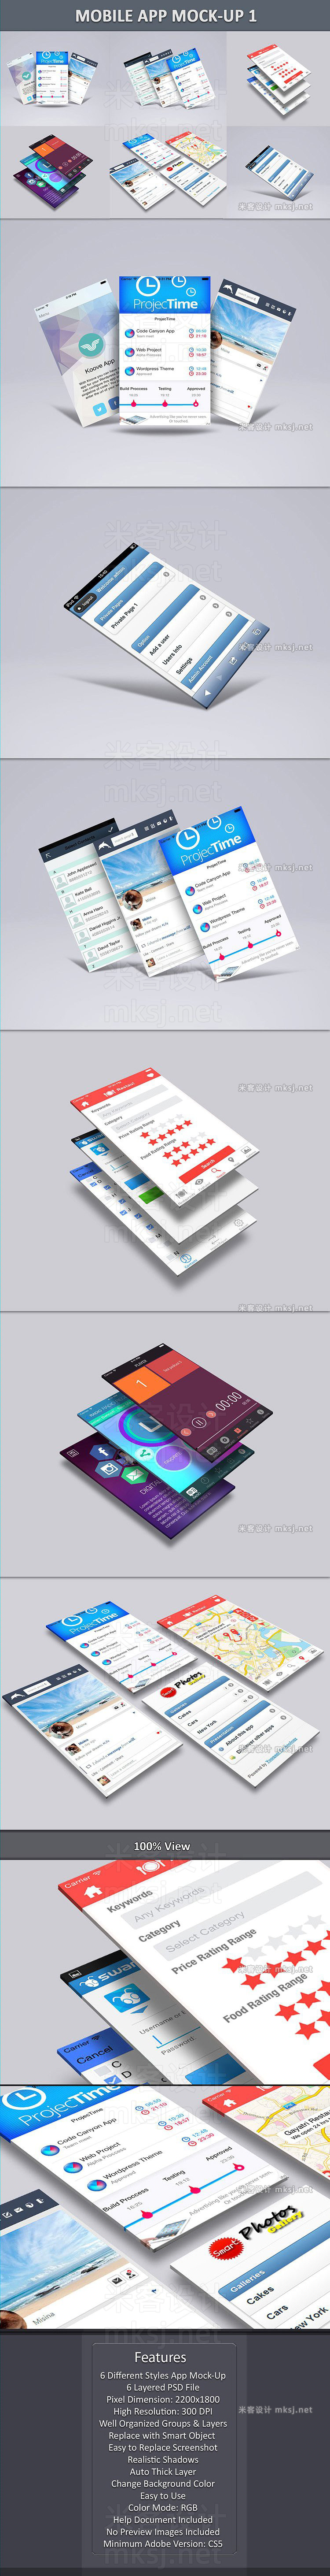 VI贴图 手机软件应用程序UI设计APP展示PS模型mockup样机